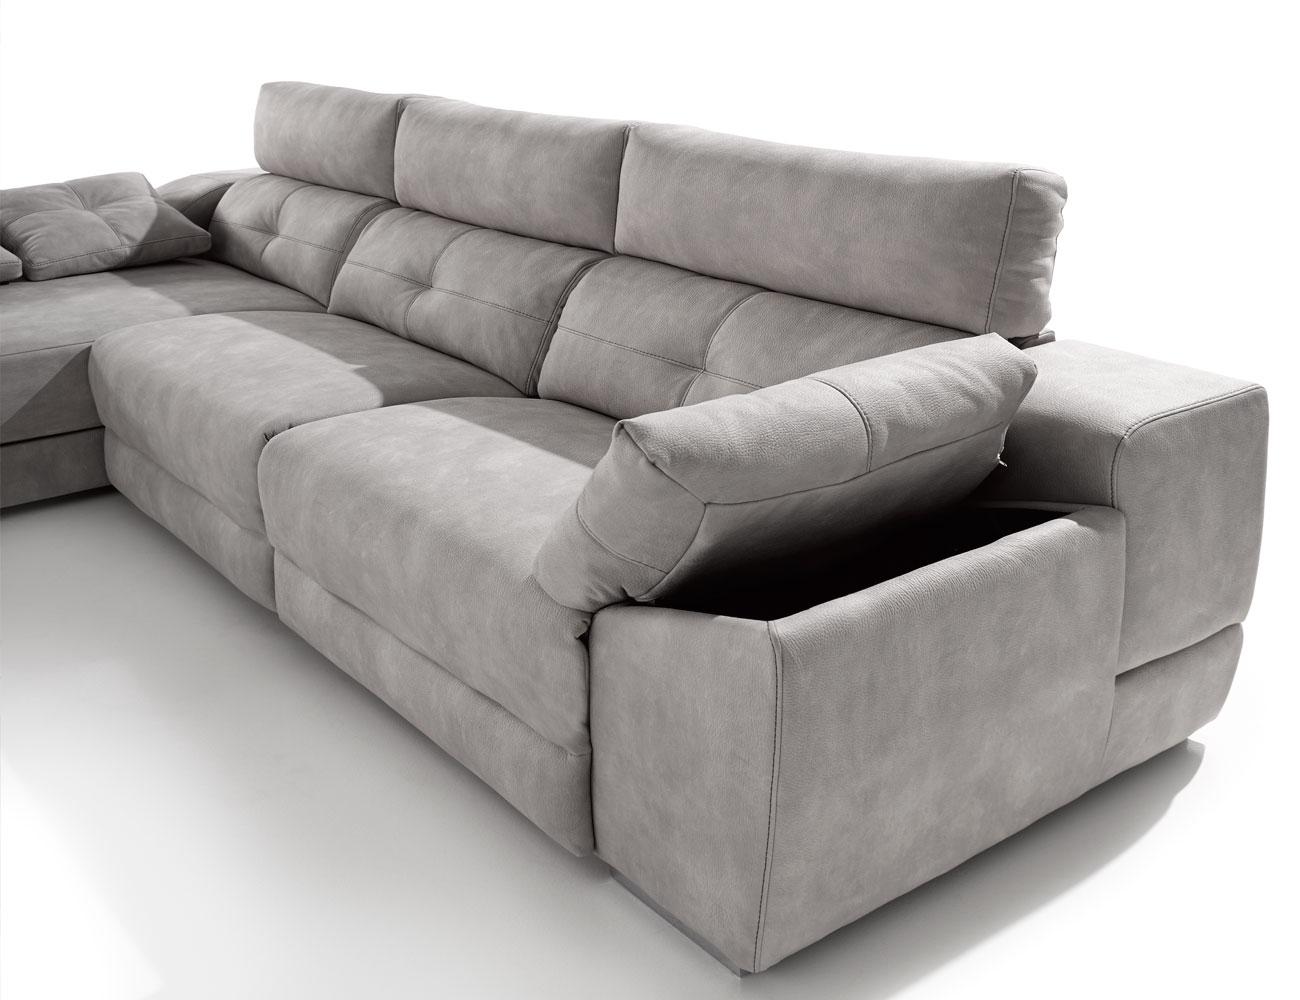 Sofa chaiselongue relax motor acomodelarcon